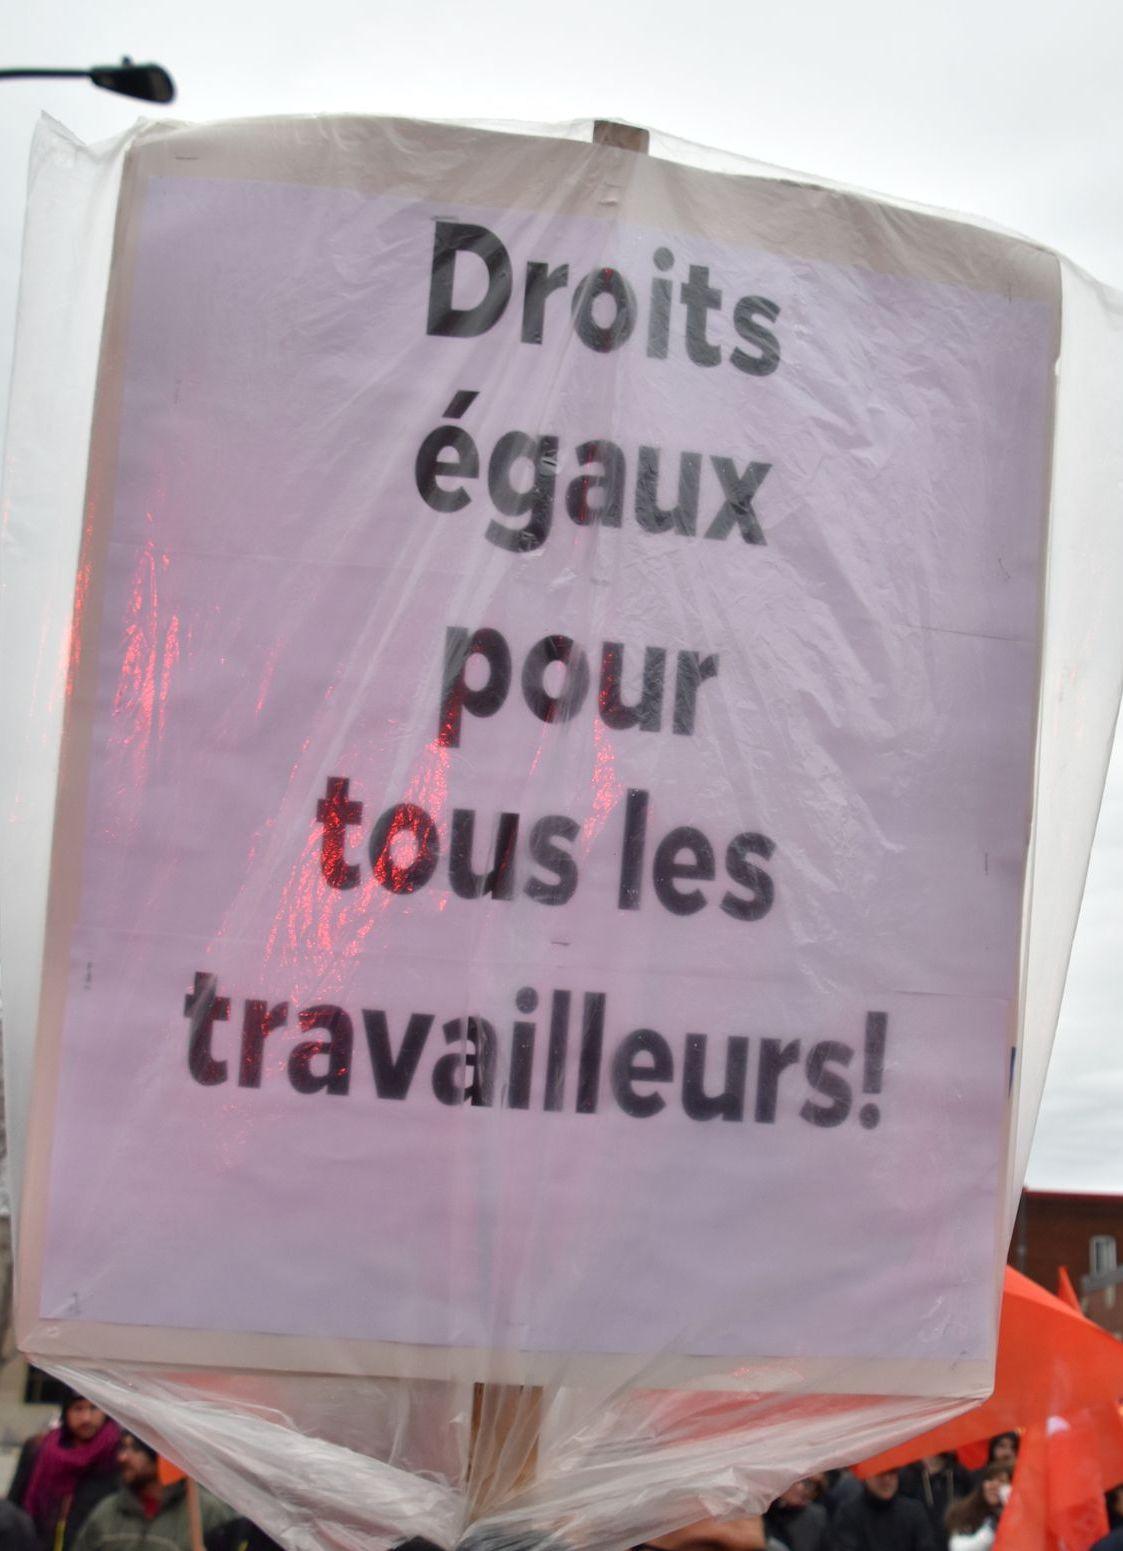 http://www.cpcml.ca/francais/Images2019/Slogans/190501-Montreal-PremierMai-21.jpg